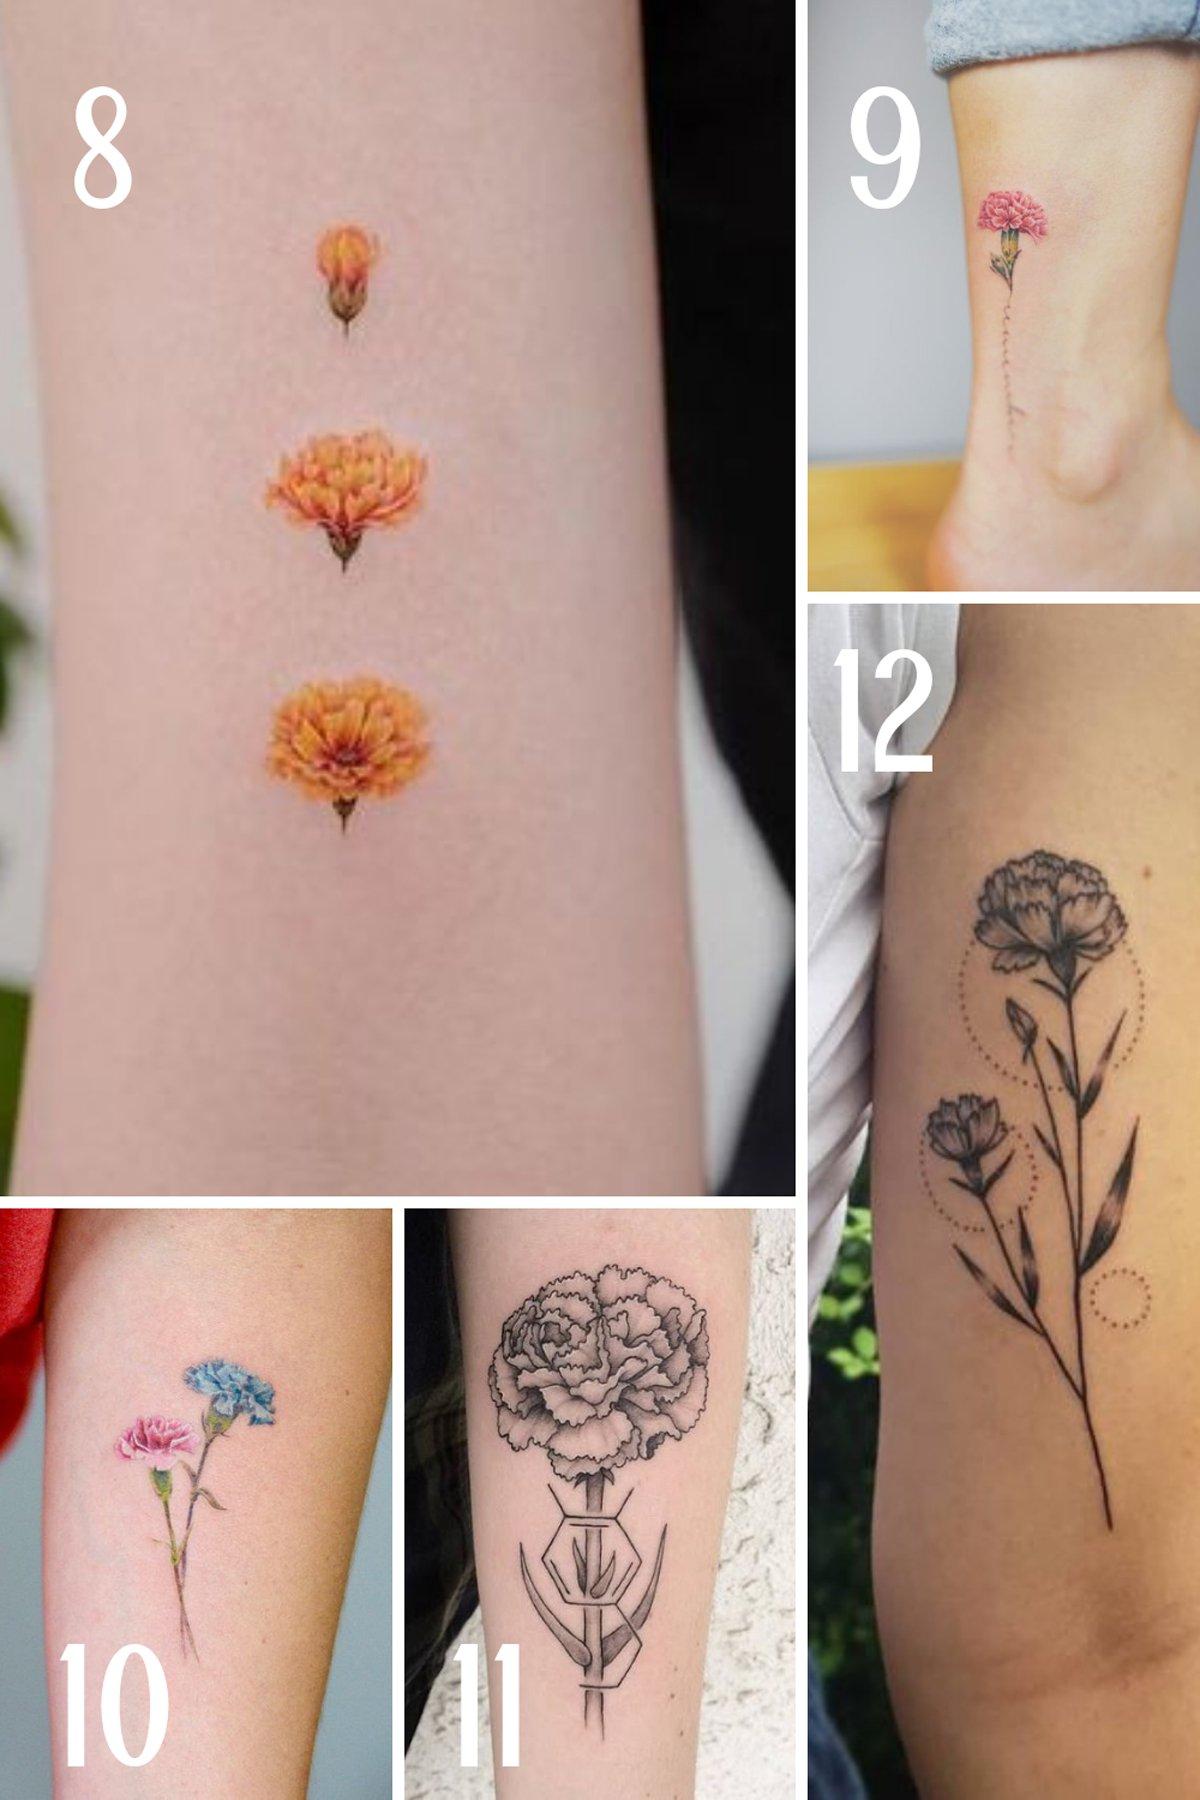 Flower Tattoos for January birthdays